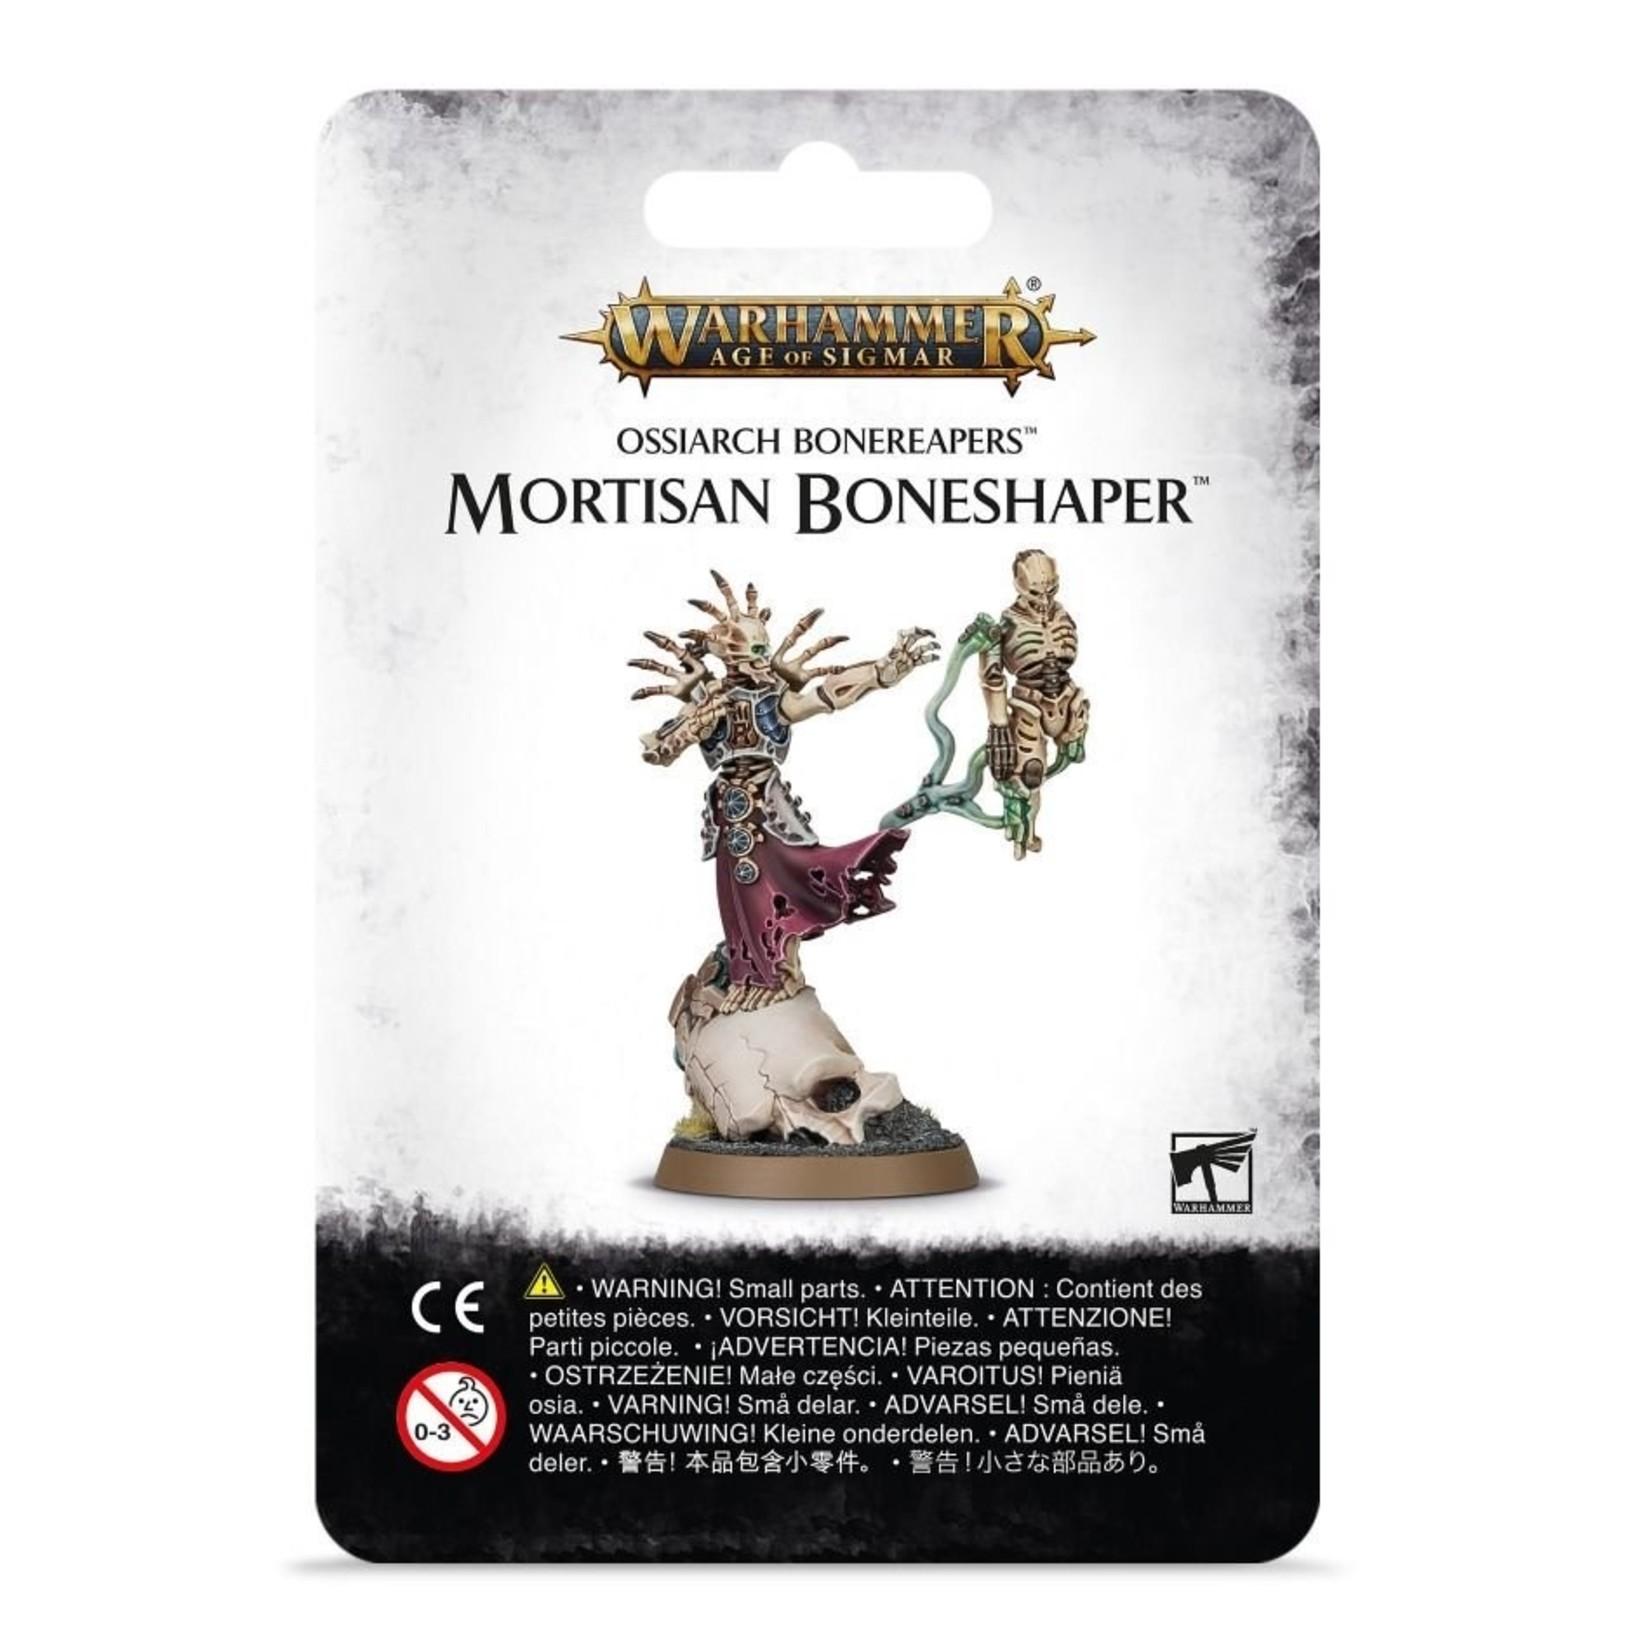 Ossiarch Bonereapers Mortisan Boneshaper (AOS)